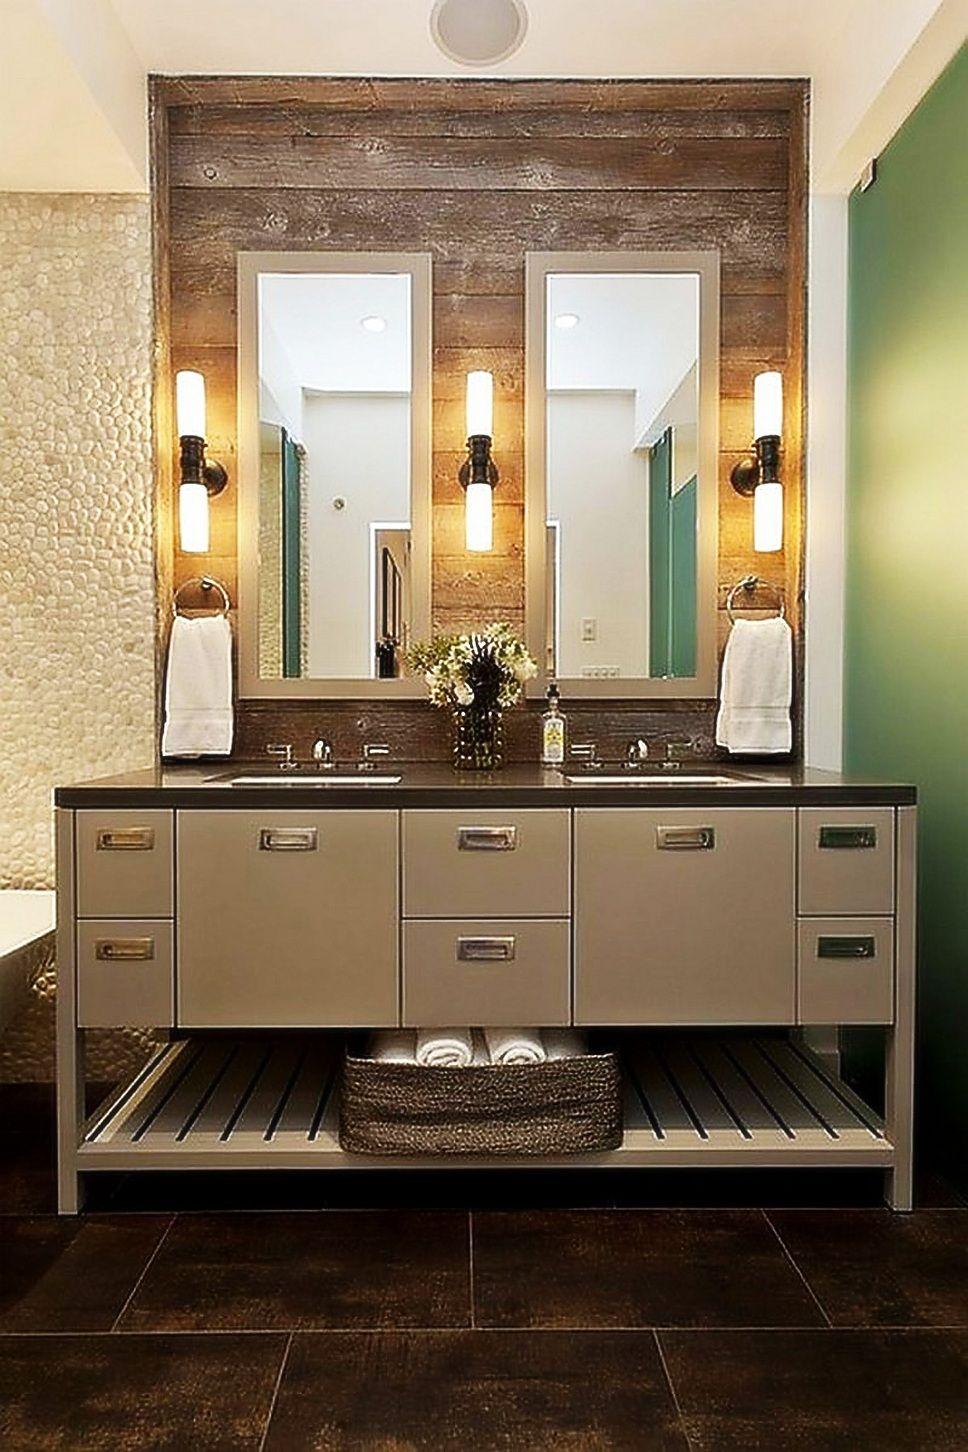 Ordinaire Led Bathroom Sconce Lights